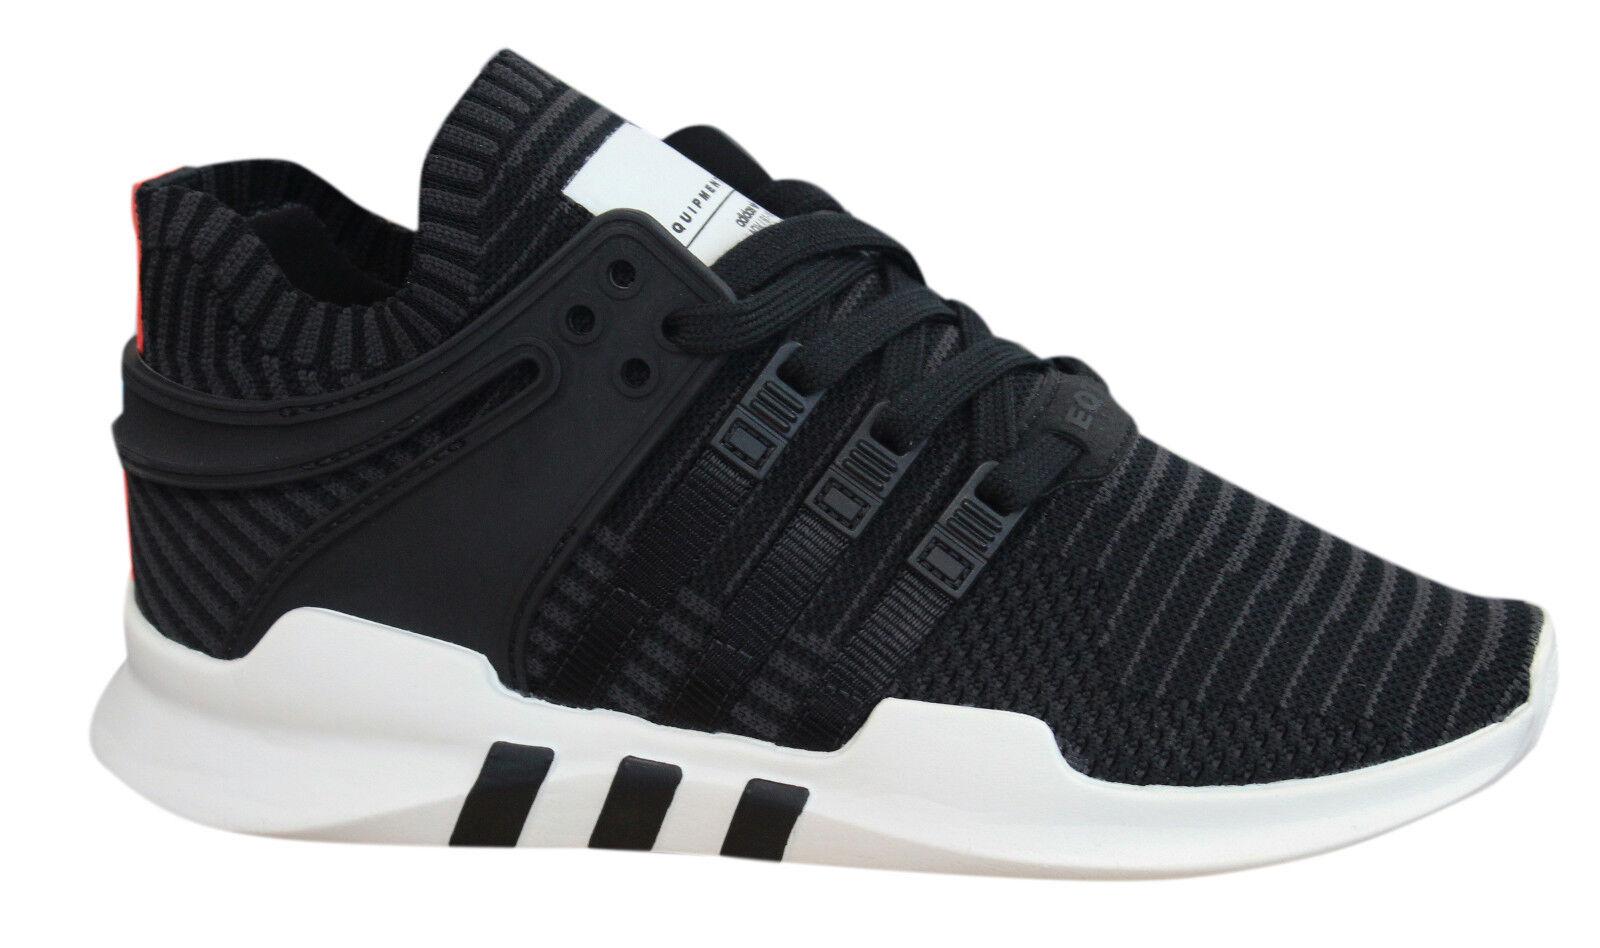 Adidas Originals Equipment Unterstützung Advance Primeknit Herren Turnschuhe